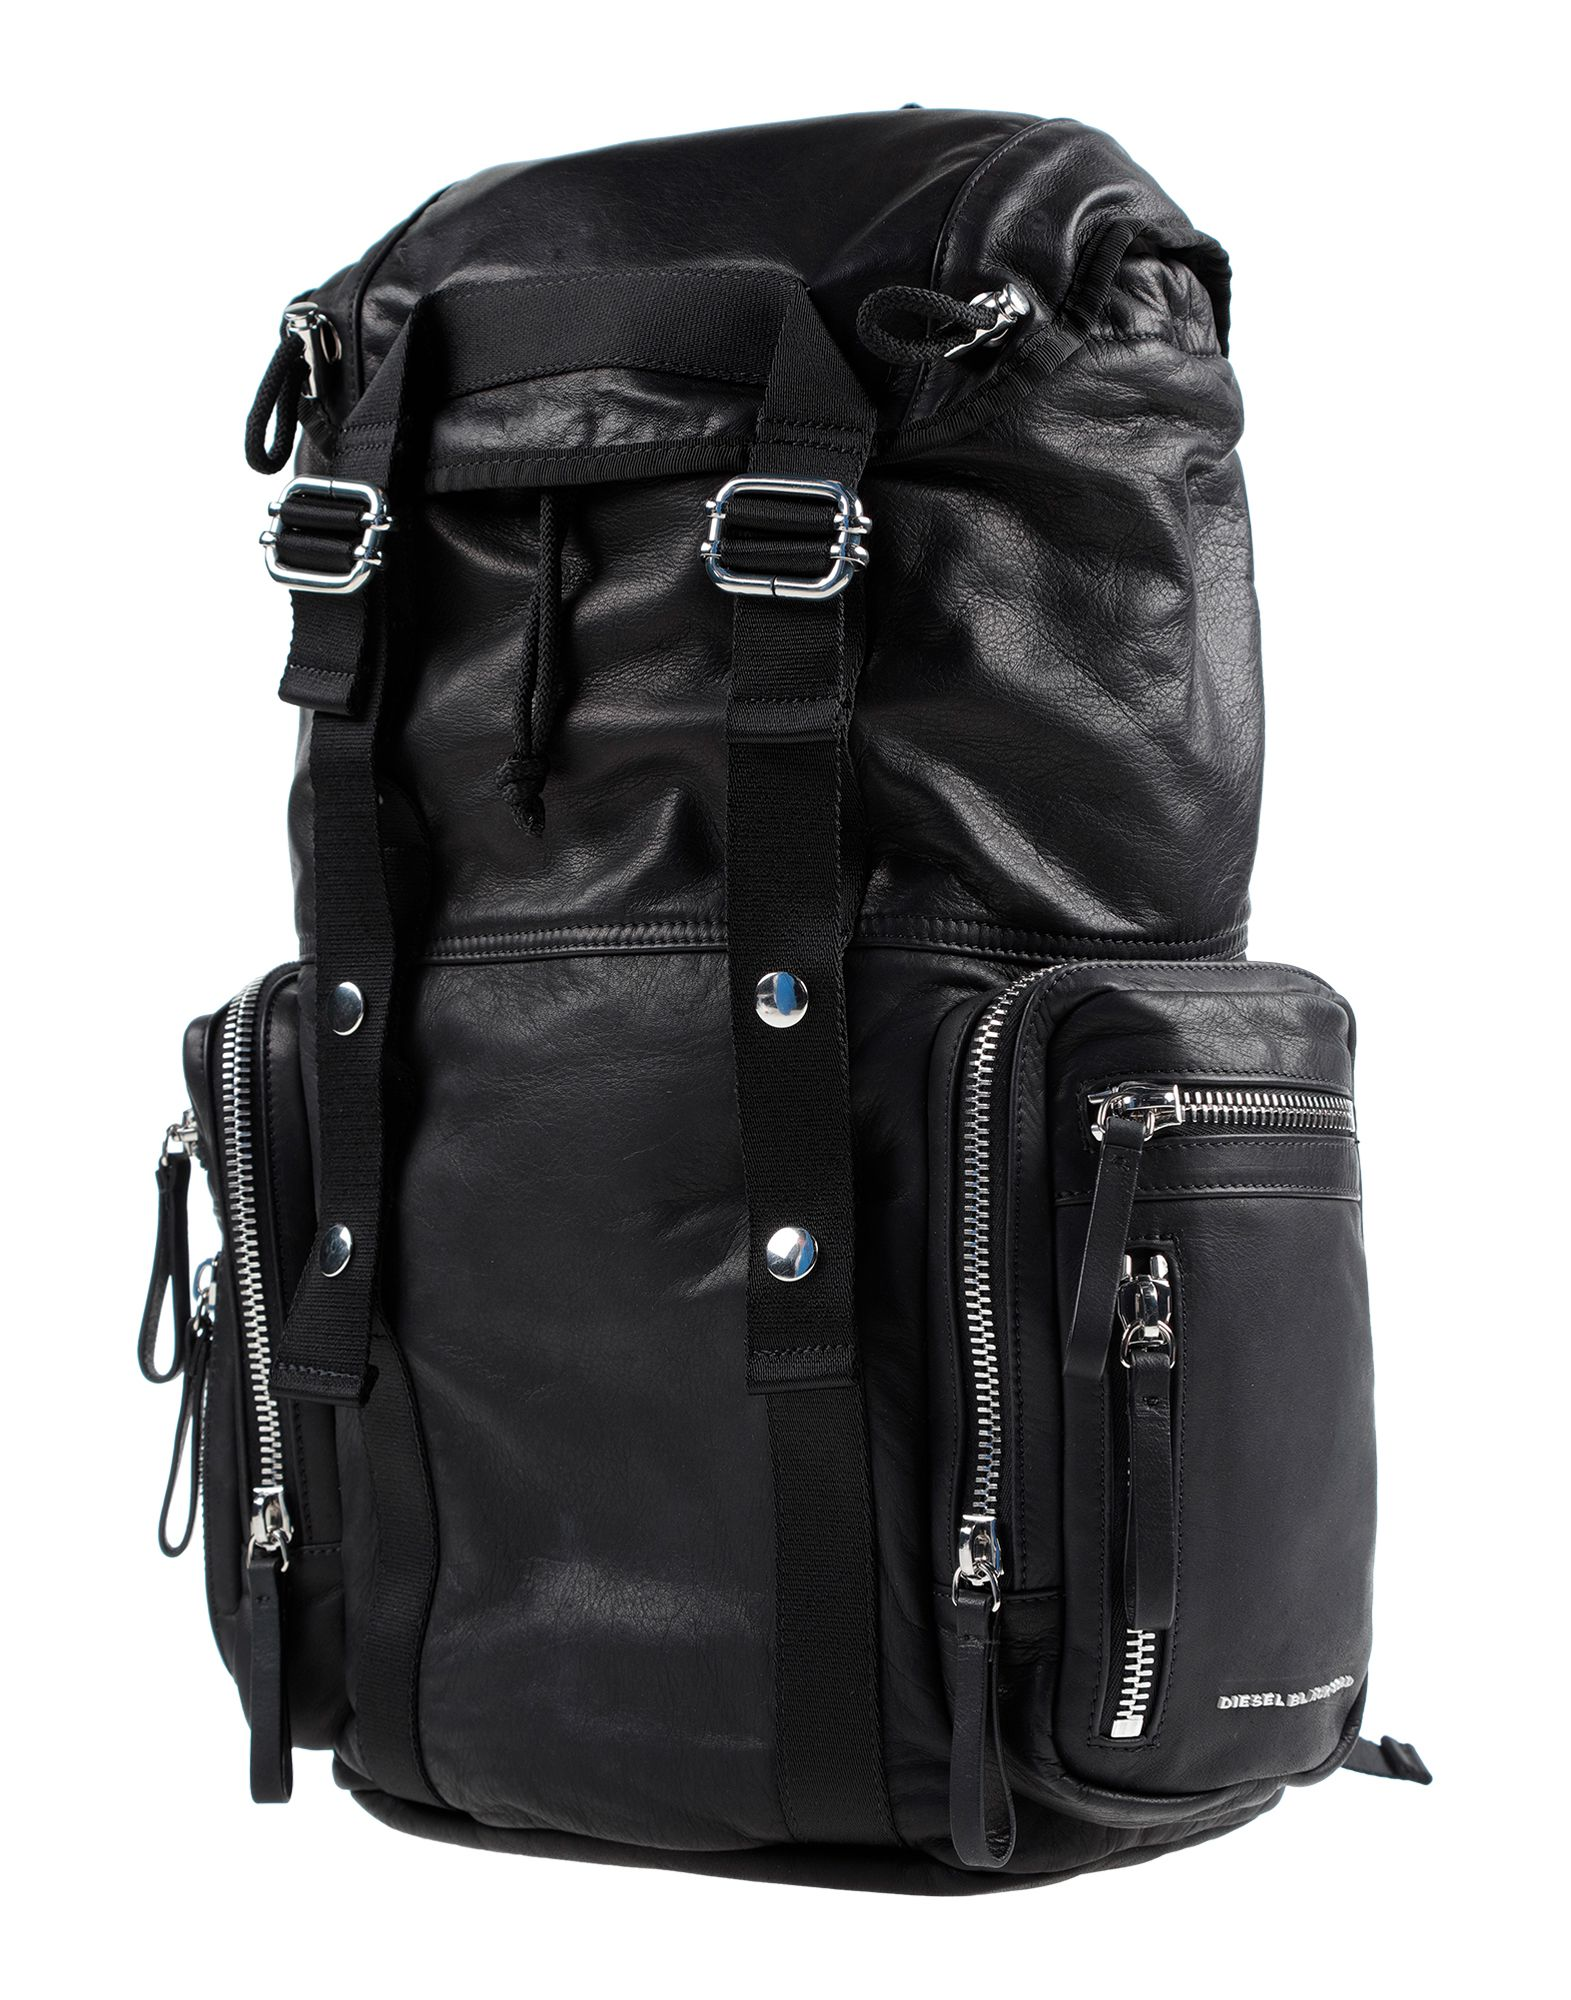 DIESEL BLACK GOLD Рюкзаки и сумки на пояс рюкзаки diesel x04822 pr886 h1146